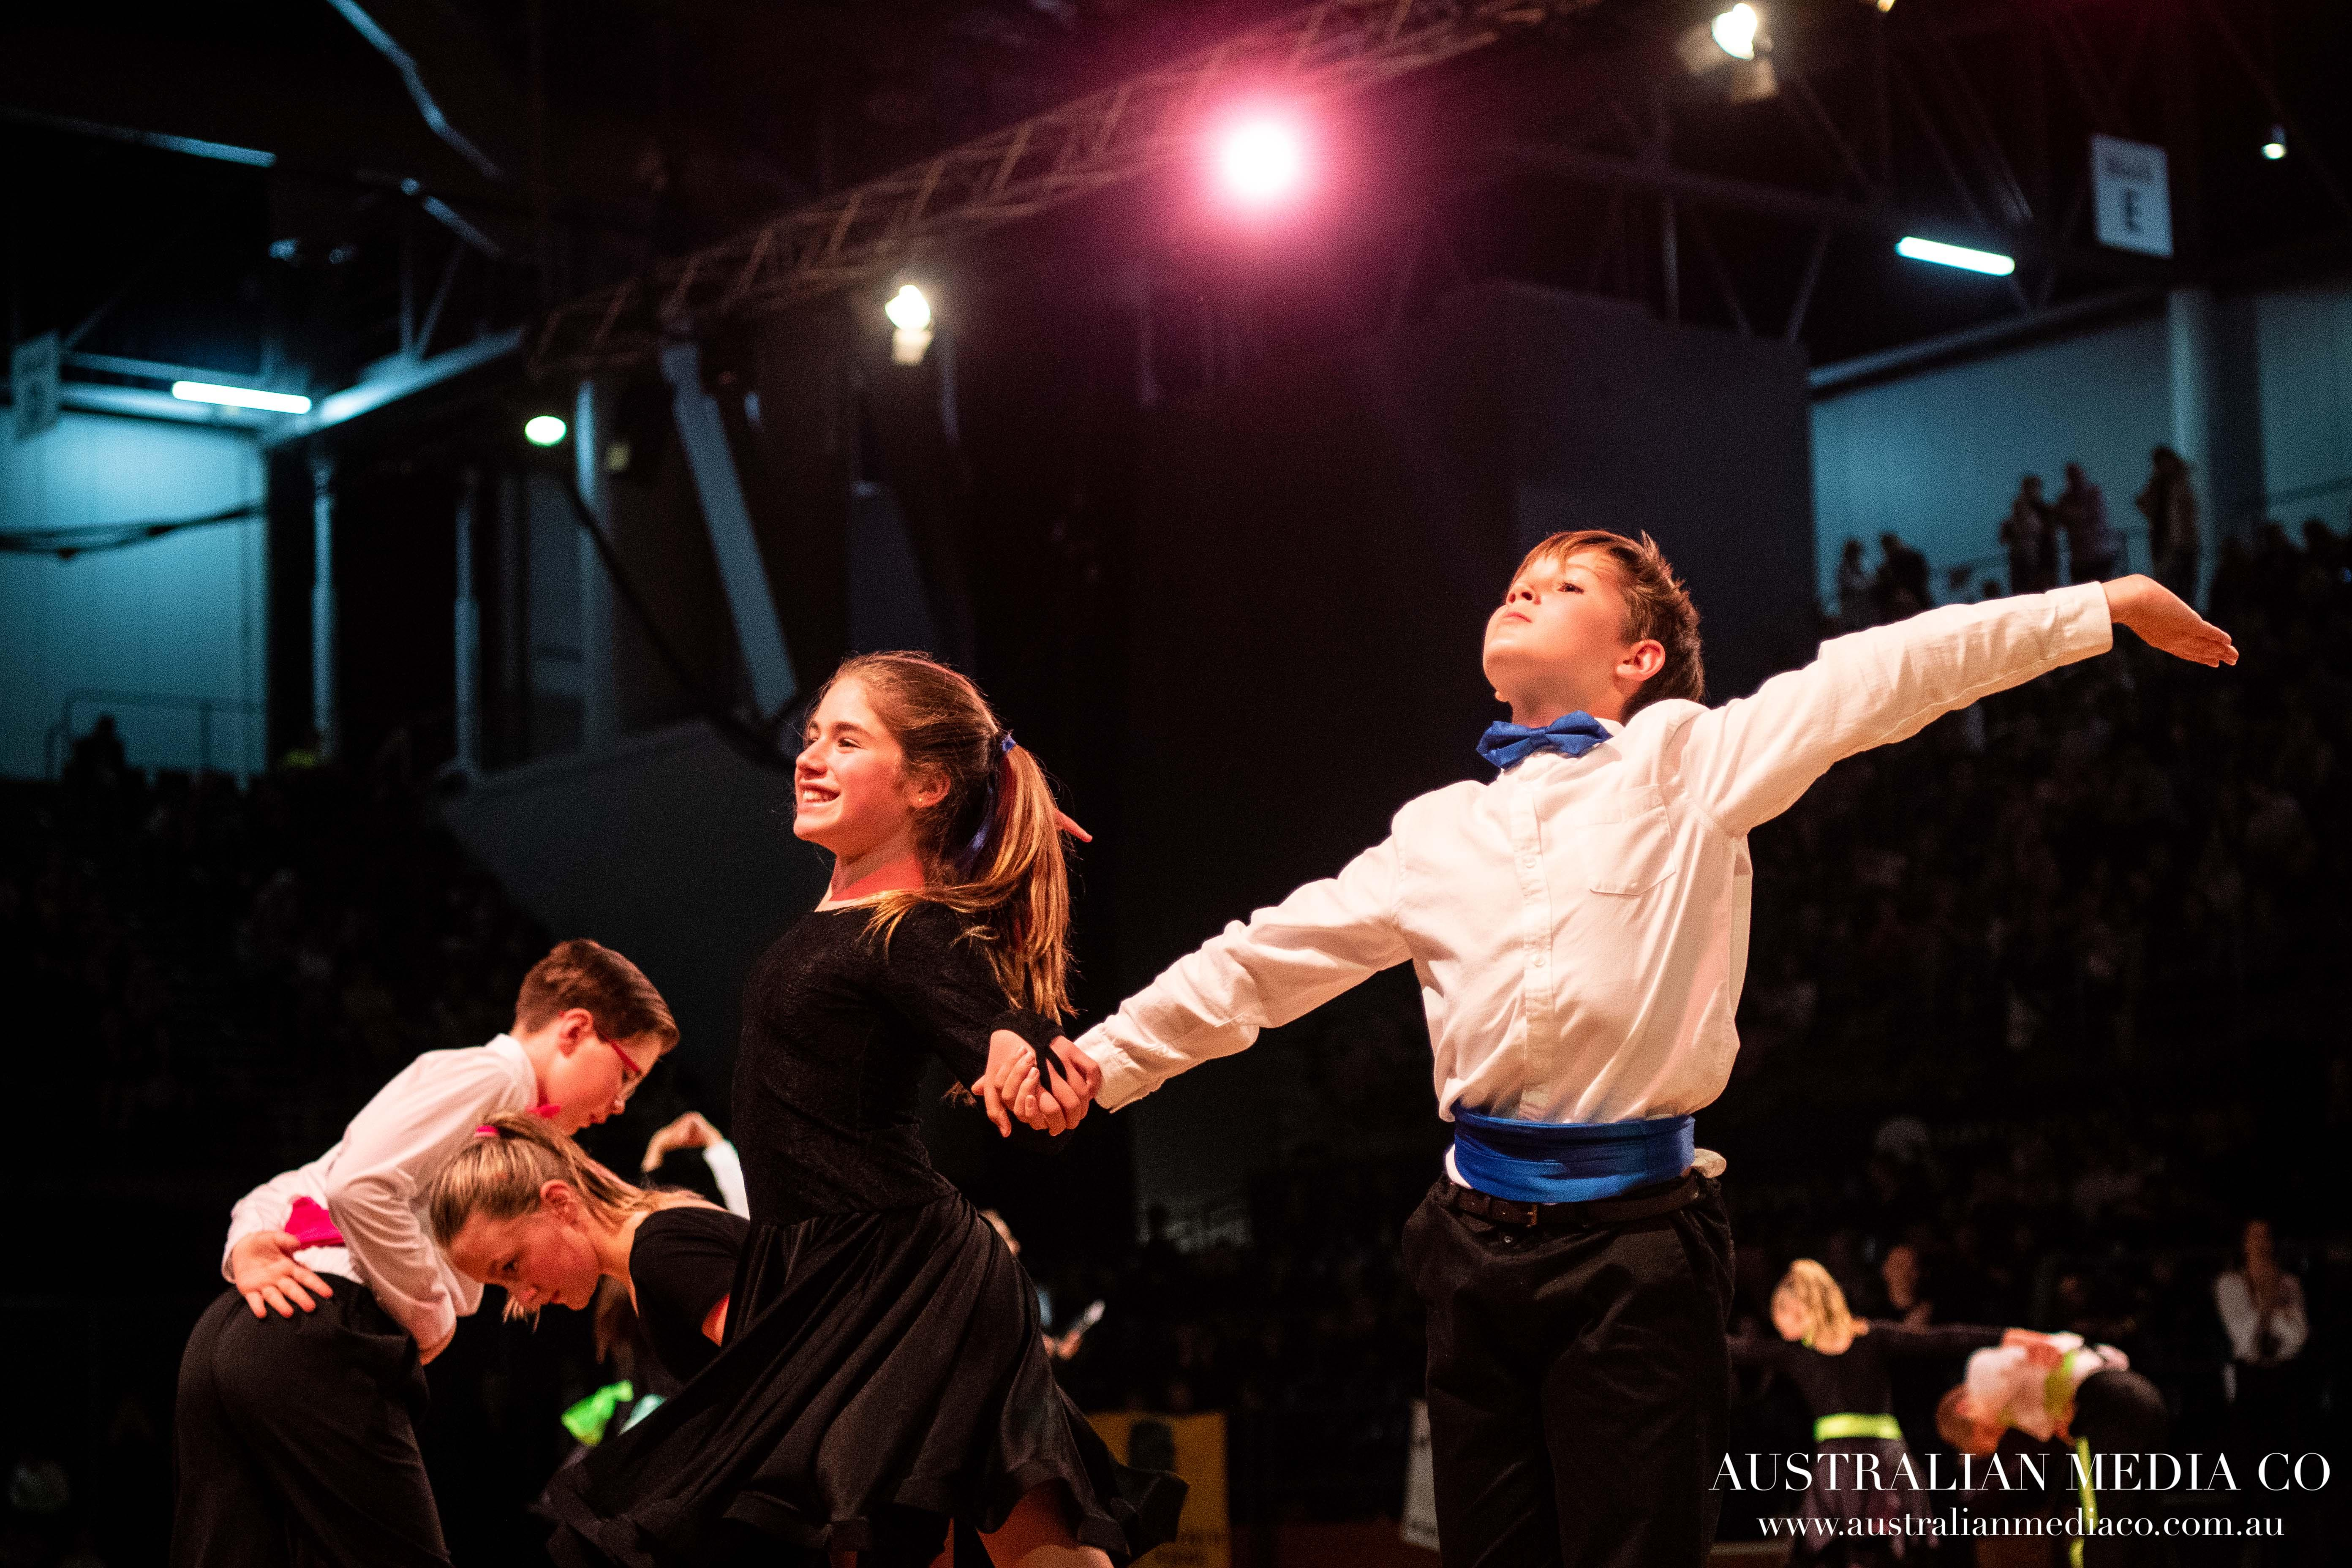 Dancesport Confidence Medal Day 4th April 2020